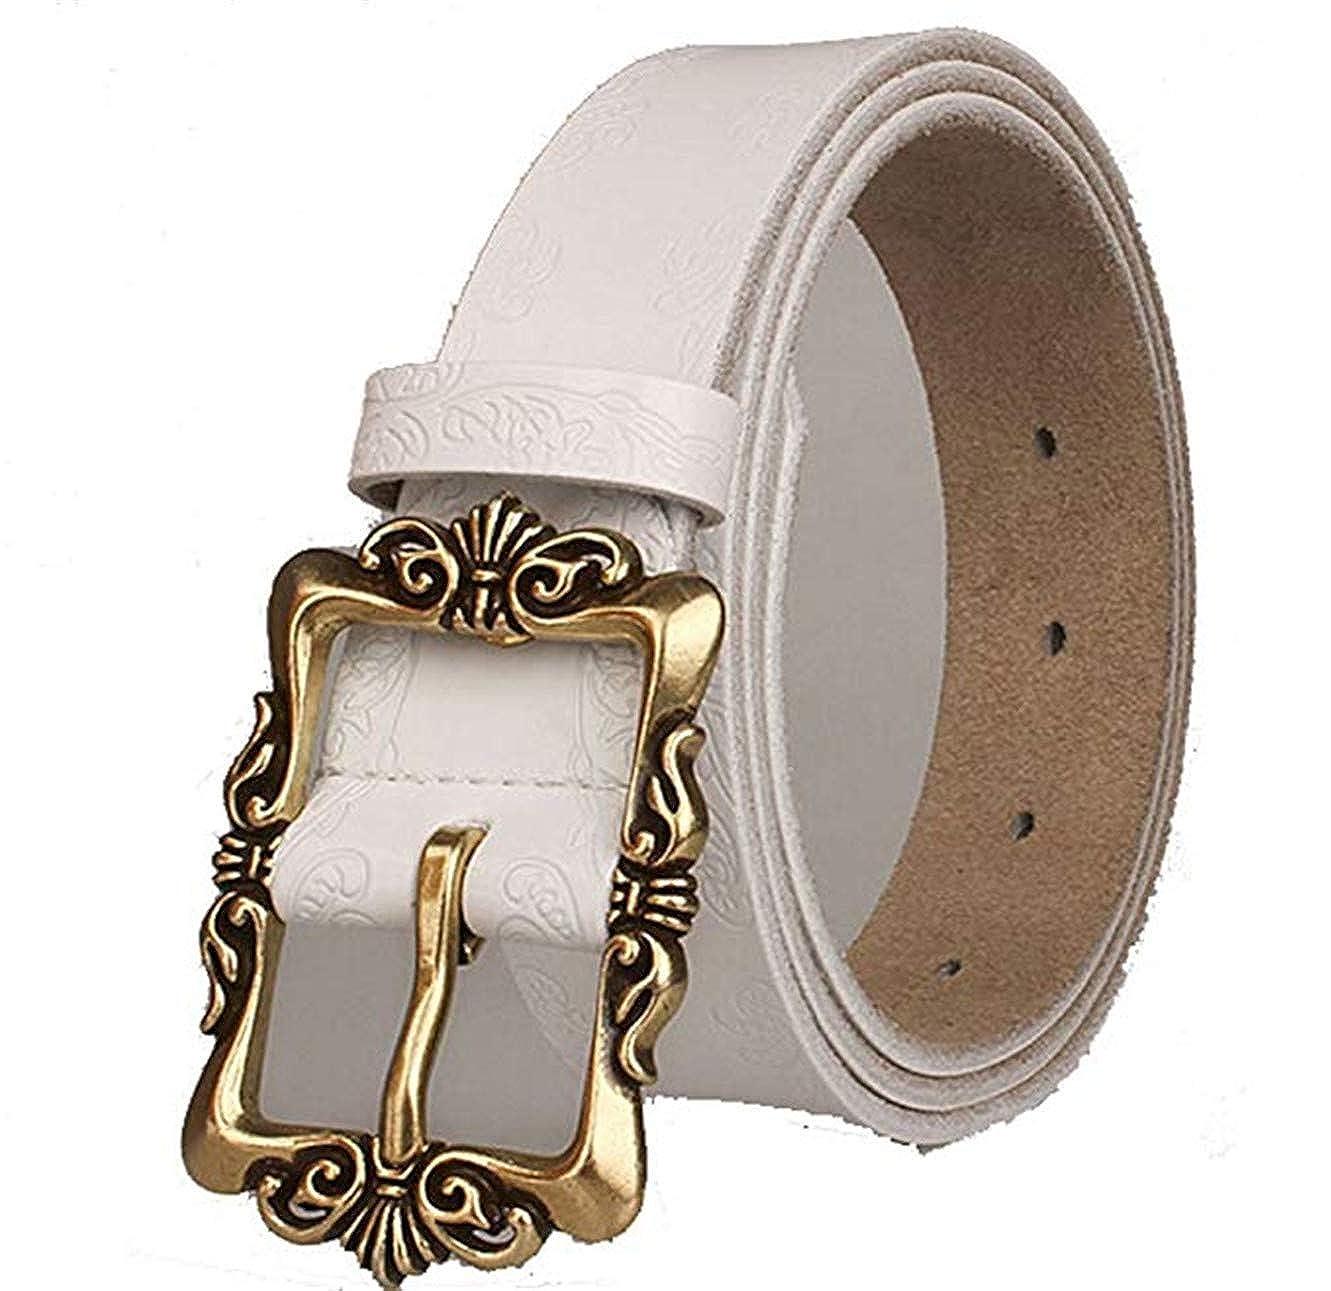 Retro Leather Embossing Waist Belt Womens Genuine Lether Belt